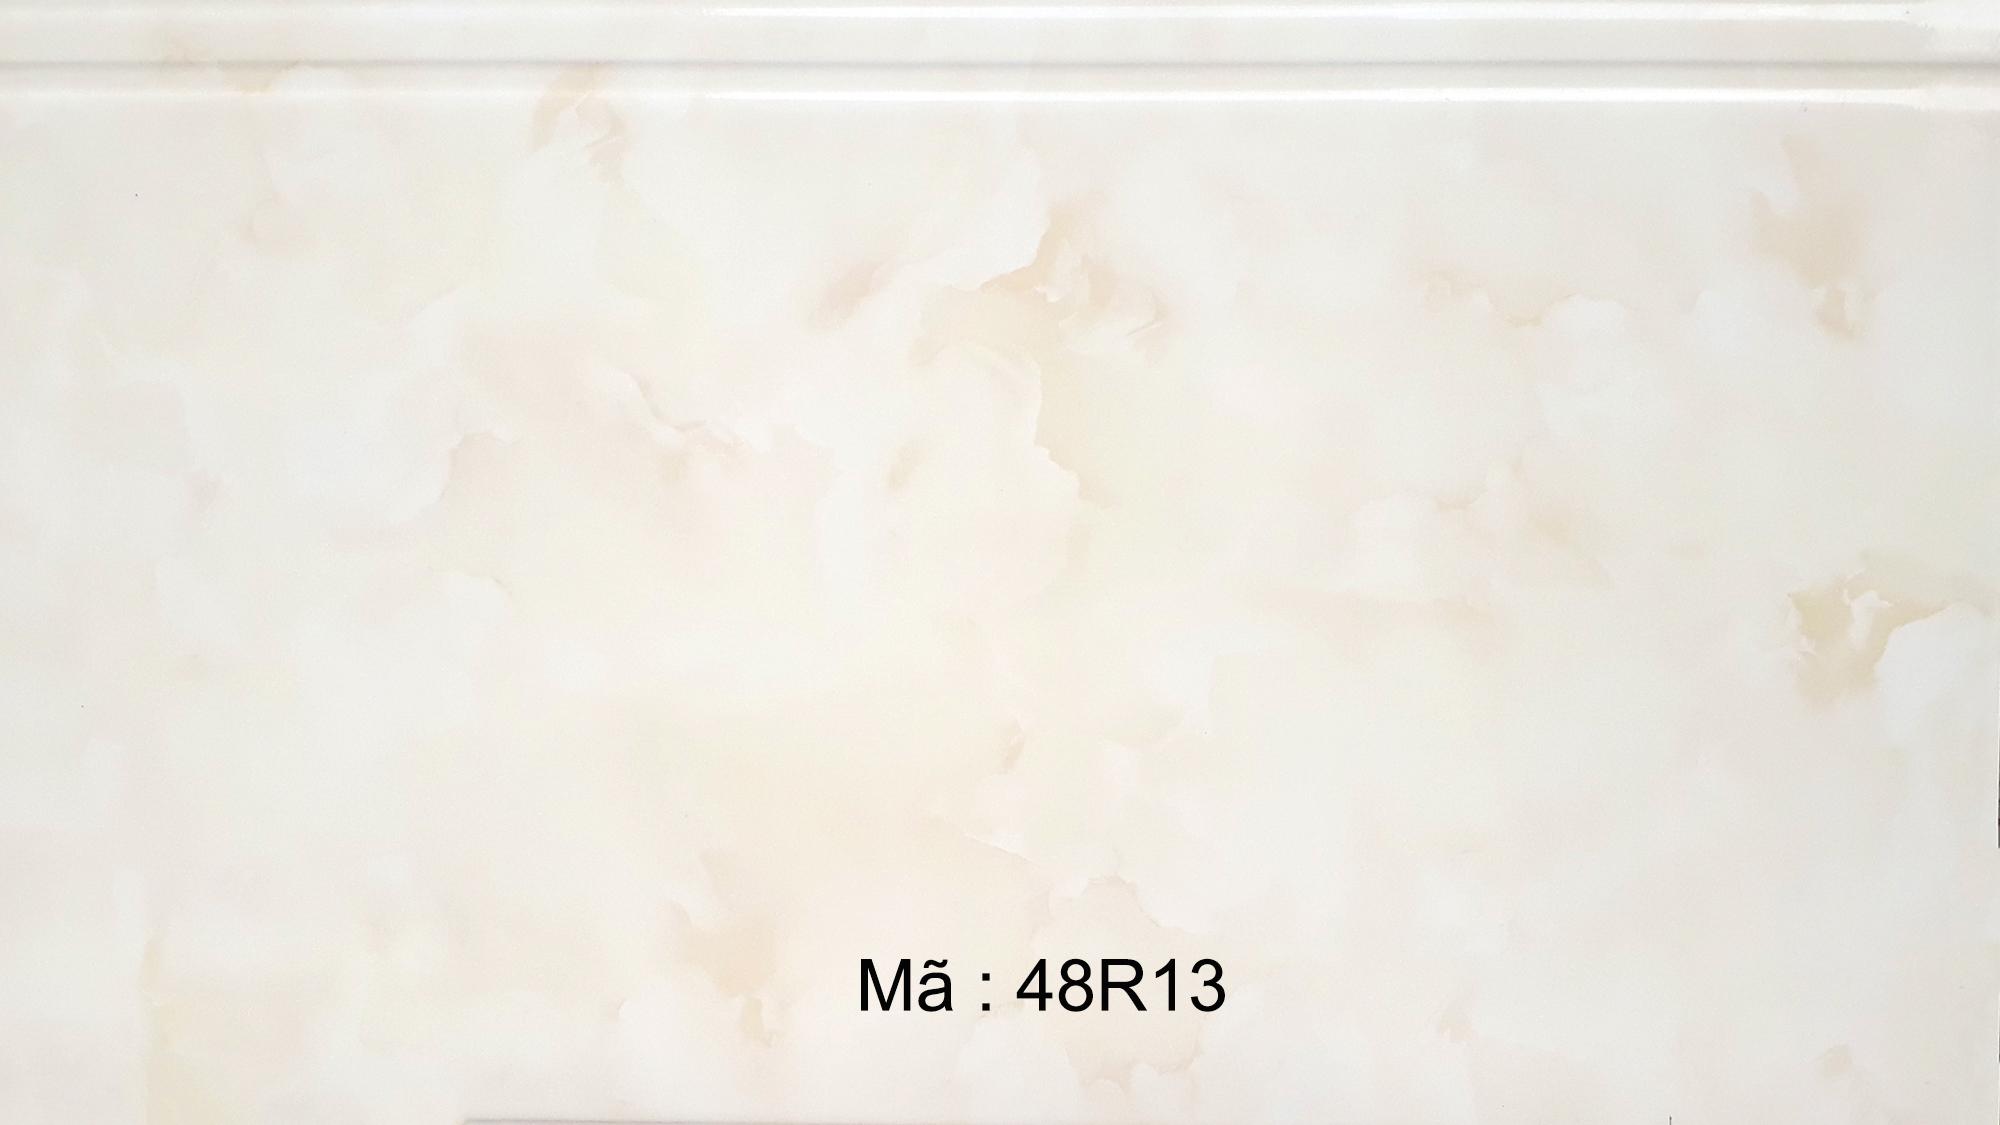 48R13